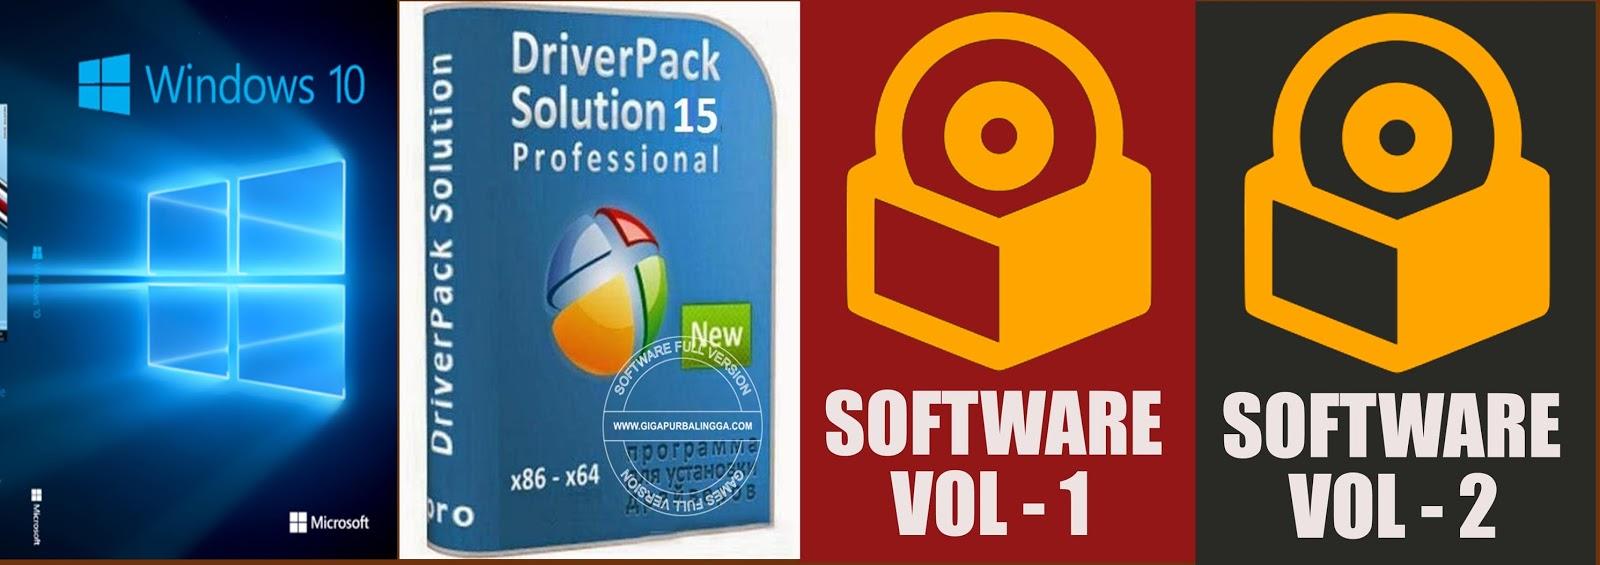 Terupdate Dan Terlengkap Jual Paket Install Ulang Dvd Windows 7 81 Flashdisk 8 Gb Software Design Adobe Photoshop After Effect Audition Illustrator Premiere Pro Cc 2017 Semua Hanya Rp 60 Rb